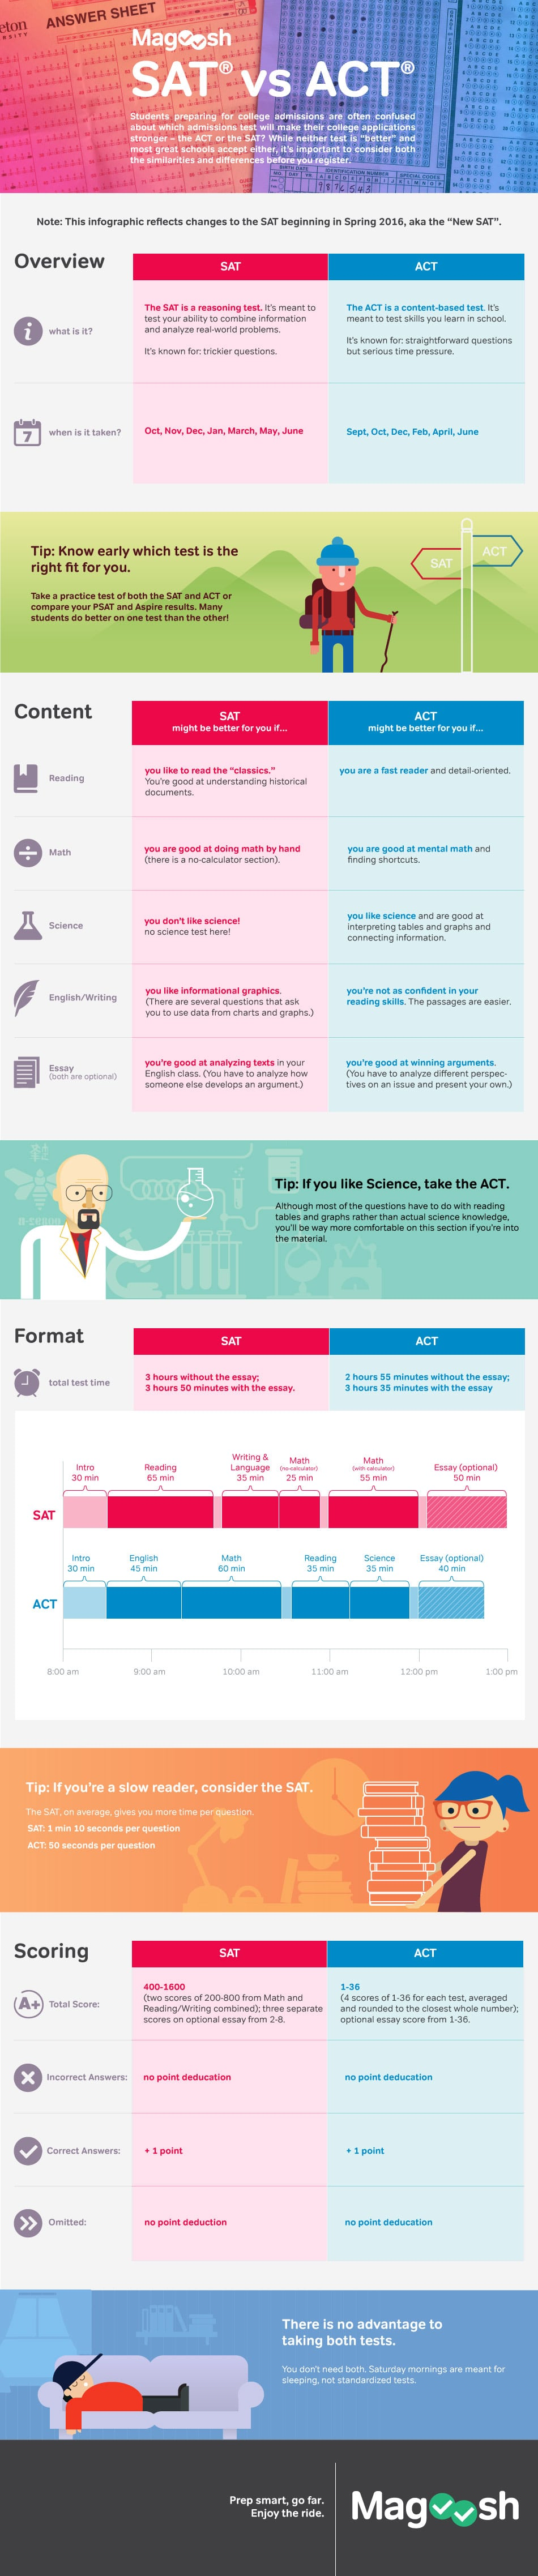 SAT vs ACT - SAT preparation online free infographics - magoosh